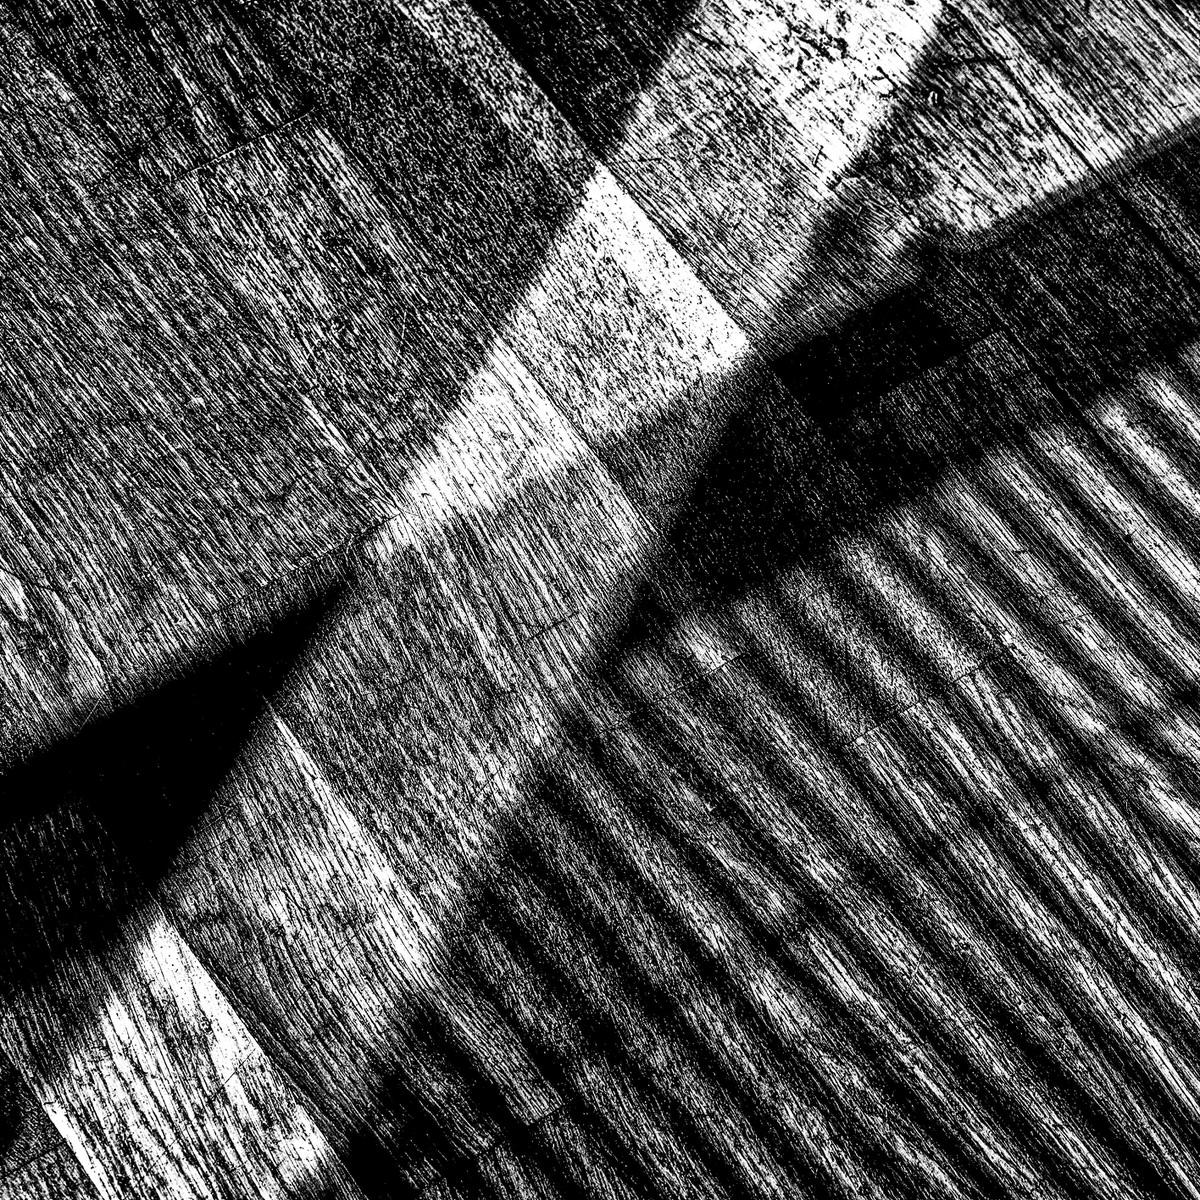 Série Variations (1) • Photo d'art • Tomasz Cichawa